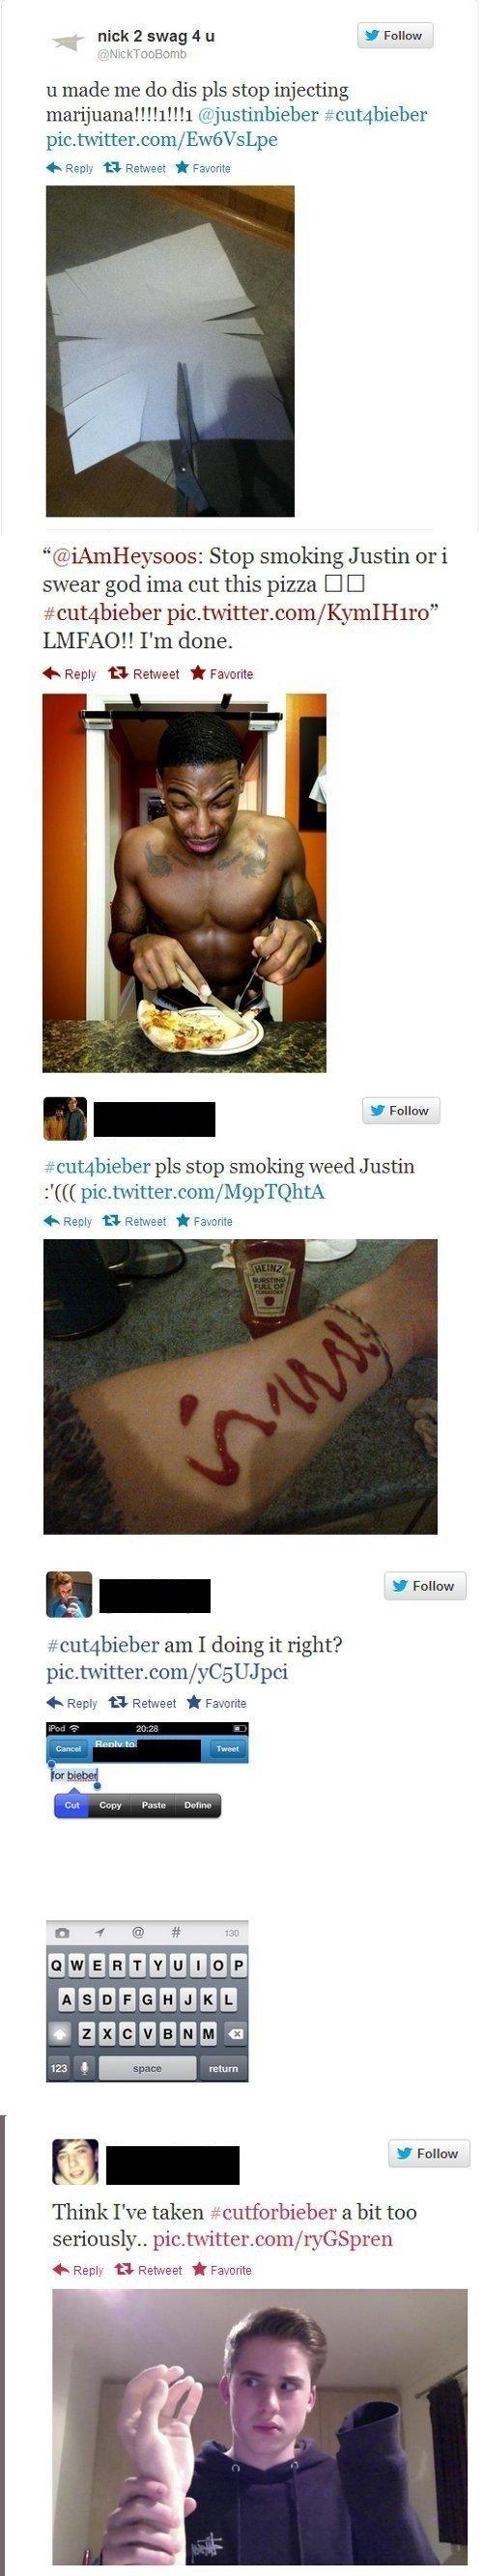 "cut4bieber. Found on . nick 2 swag 4 u I Follow ll made me do dis pls stop injecting mari) Liana! ! Hill (,ii. imjustinbieber . in feelly "" i Favorita Stop smok cut for Bieber"